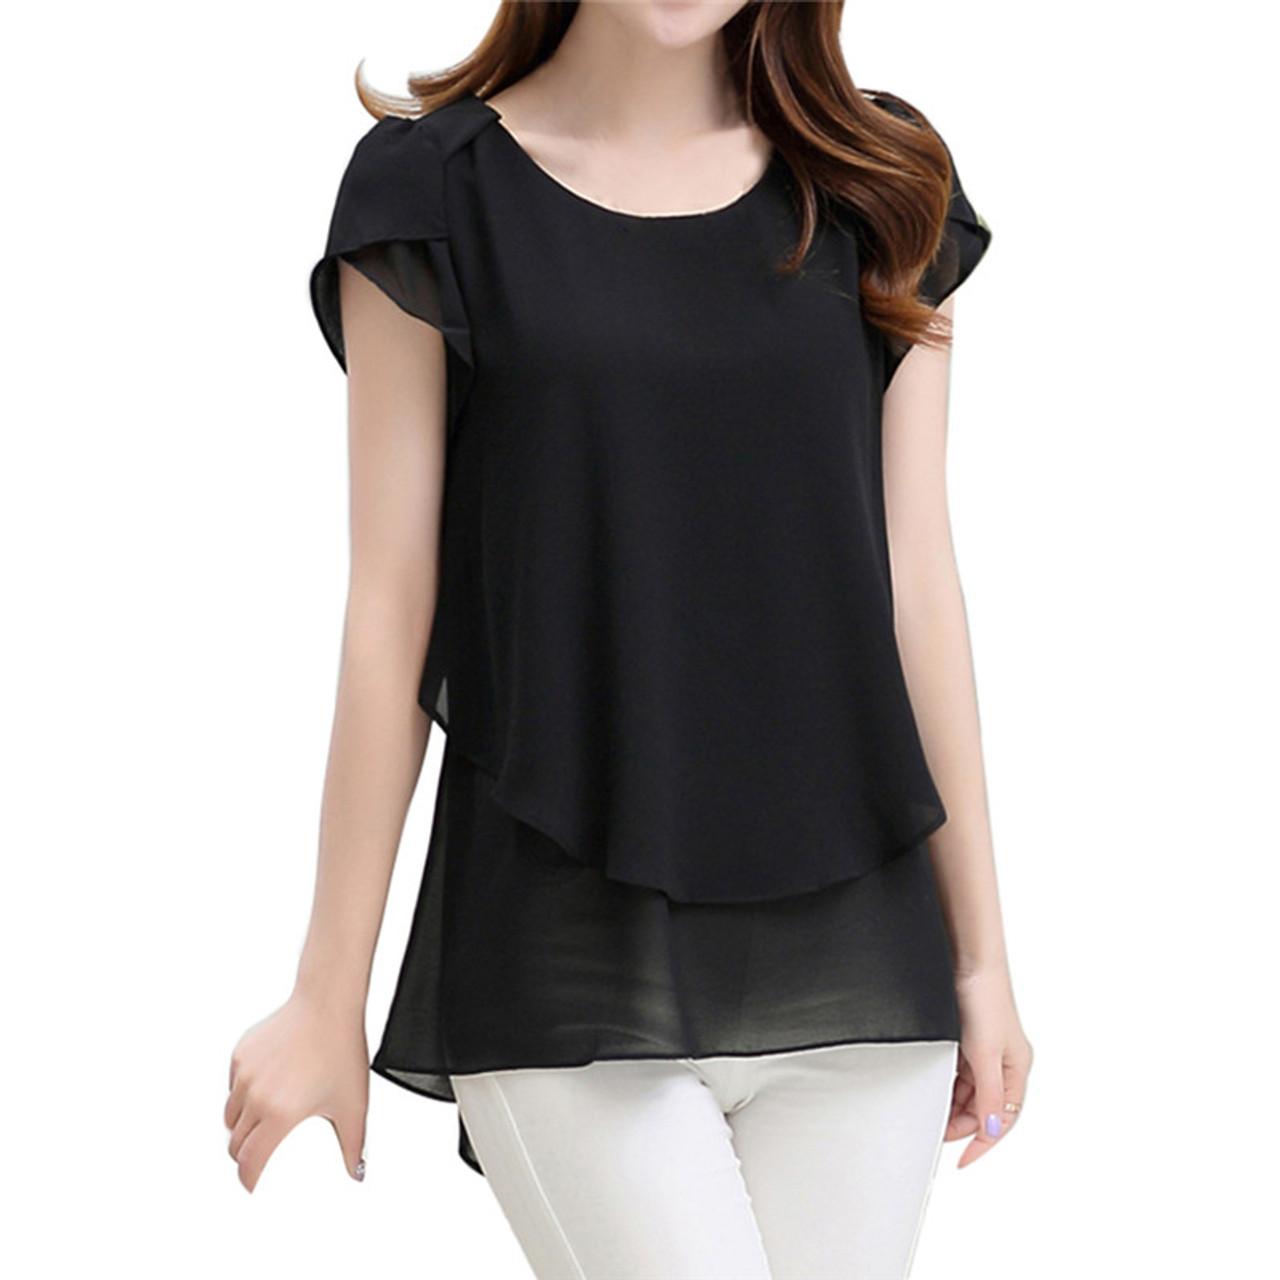 9aa387cd1b9 ... 2017 Womens Short Sleeve Chiffon Blouse Peplum Summer Tops Ladies Long  Office Shirts Plus Size Ruffle ...